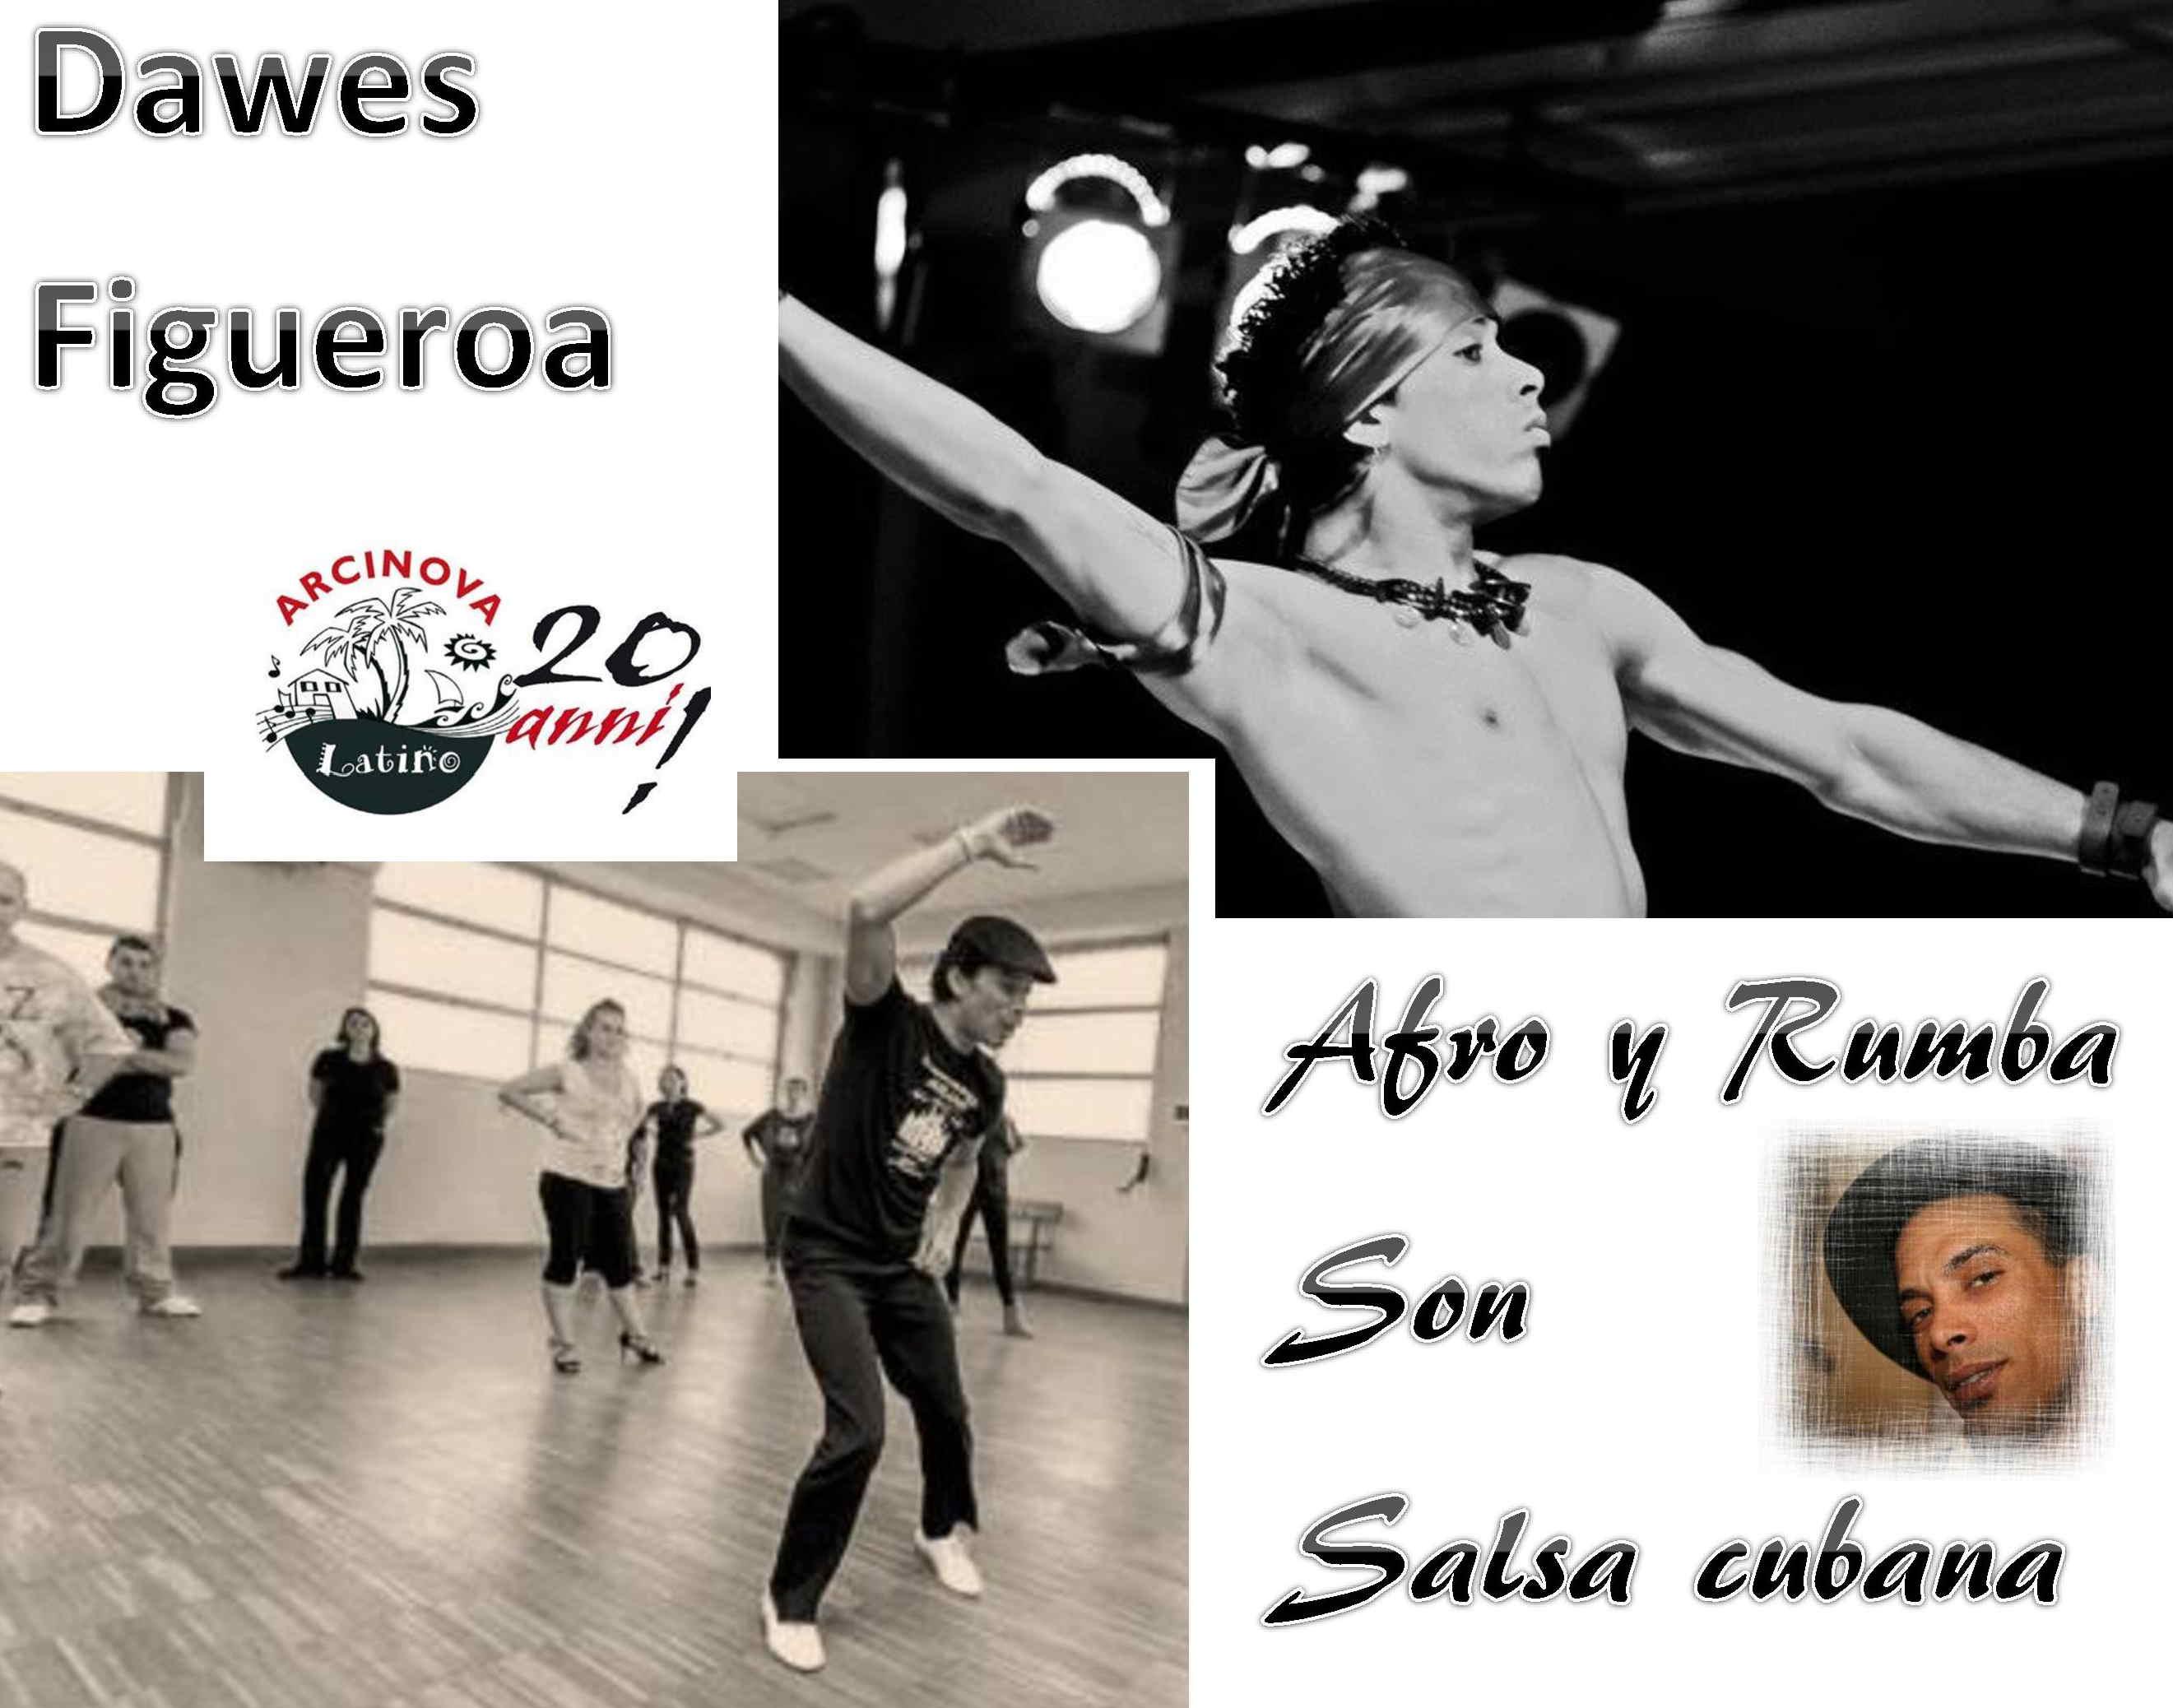 Dawes Figueroa 20 anni-page-001